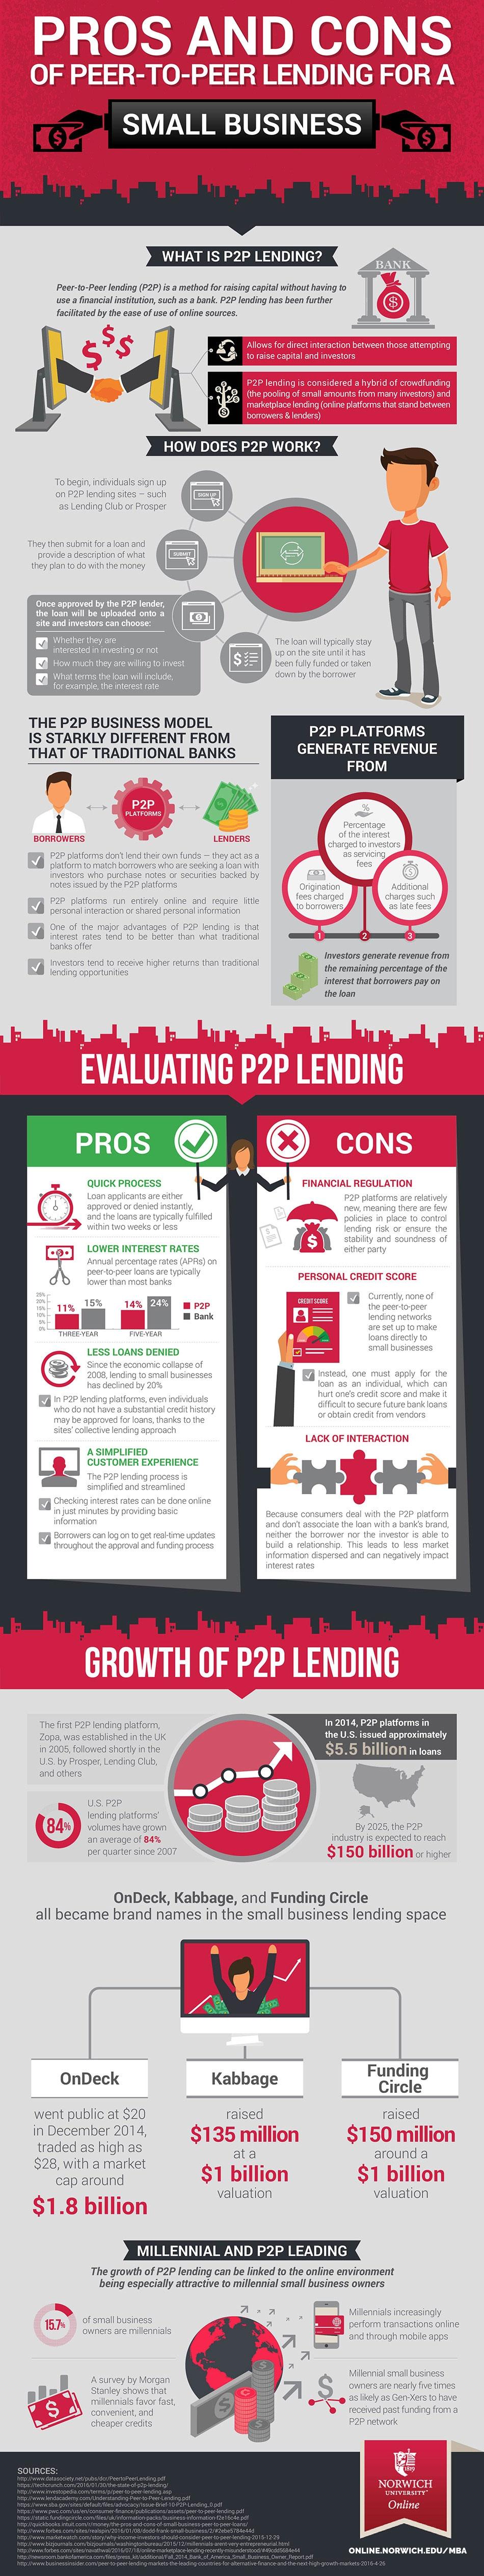 peer lending infographic image